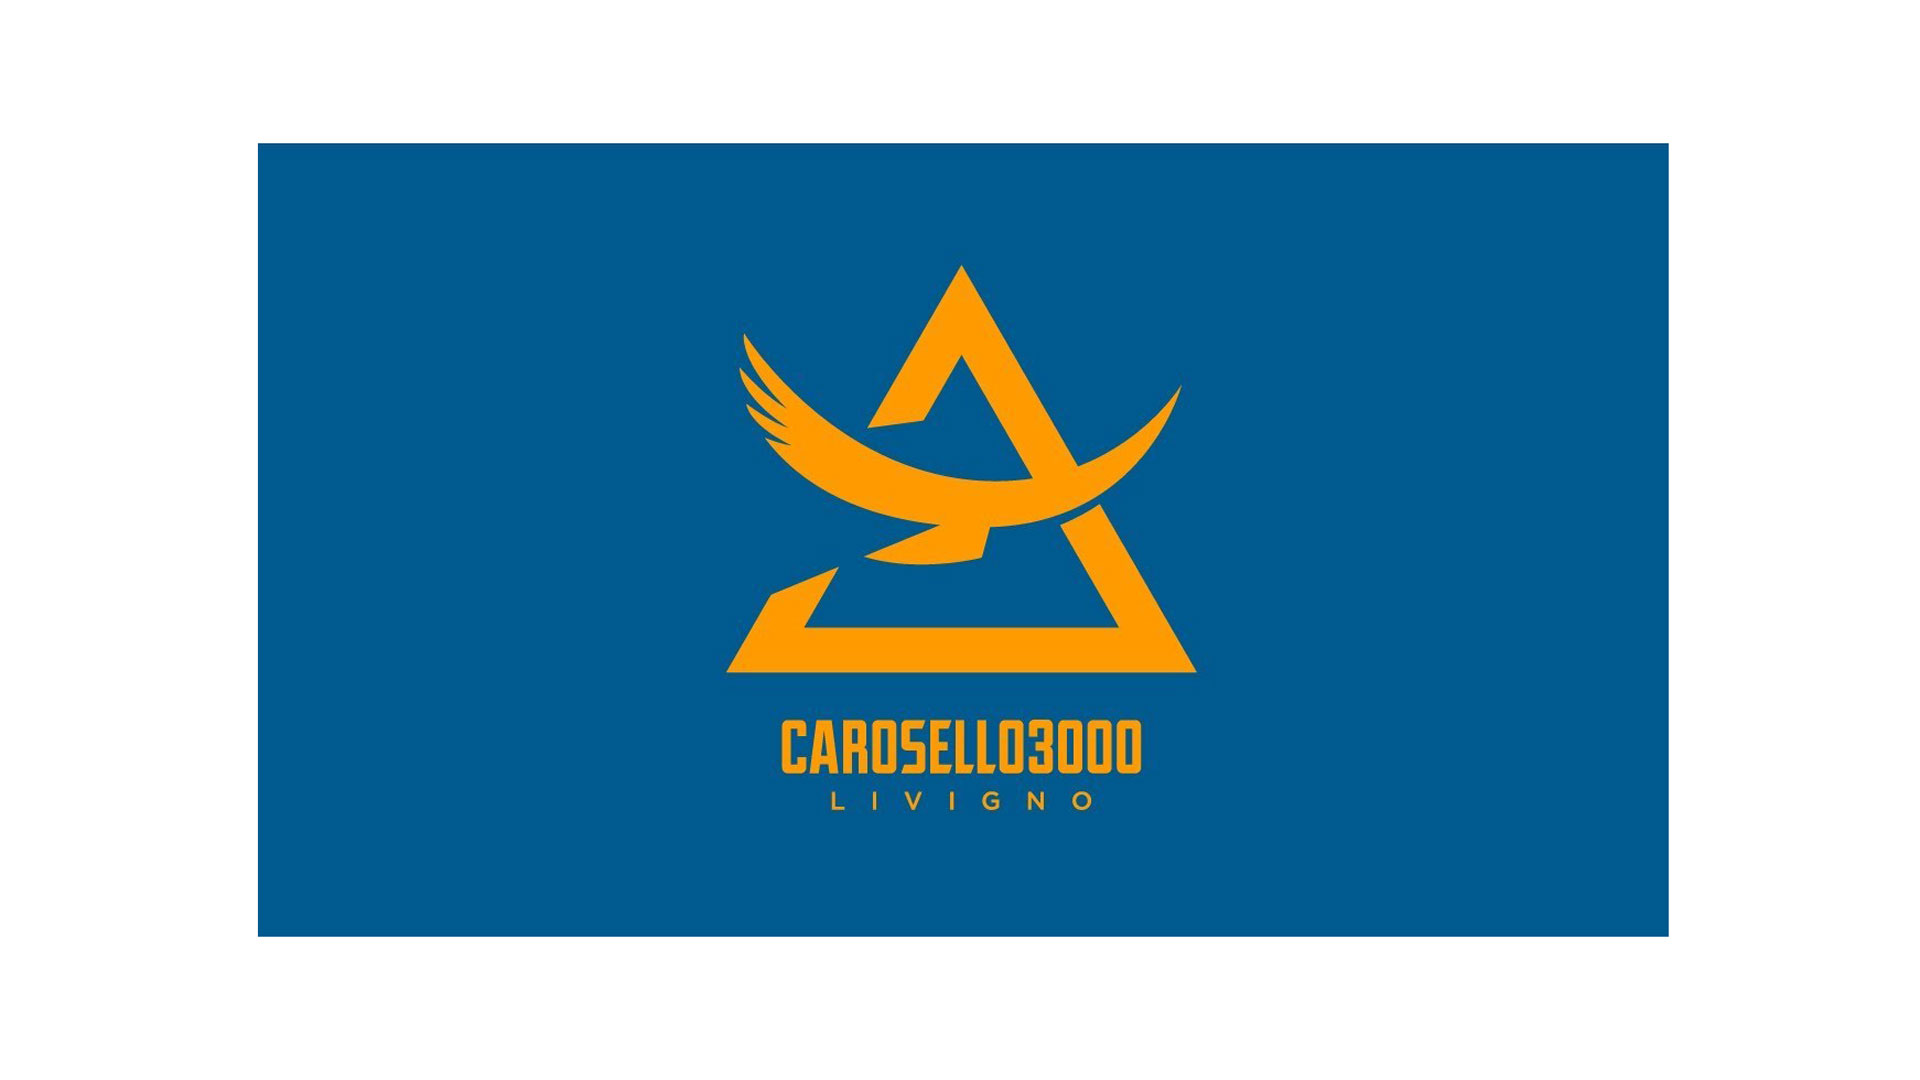 Carosello3000 Logo